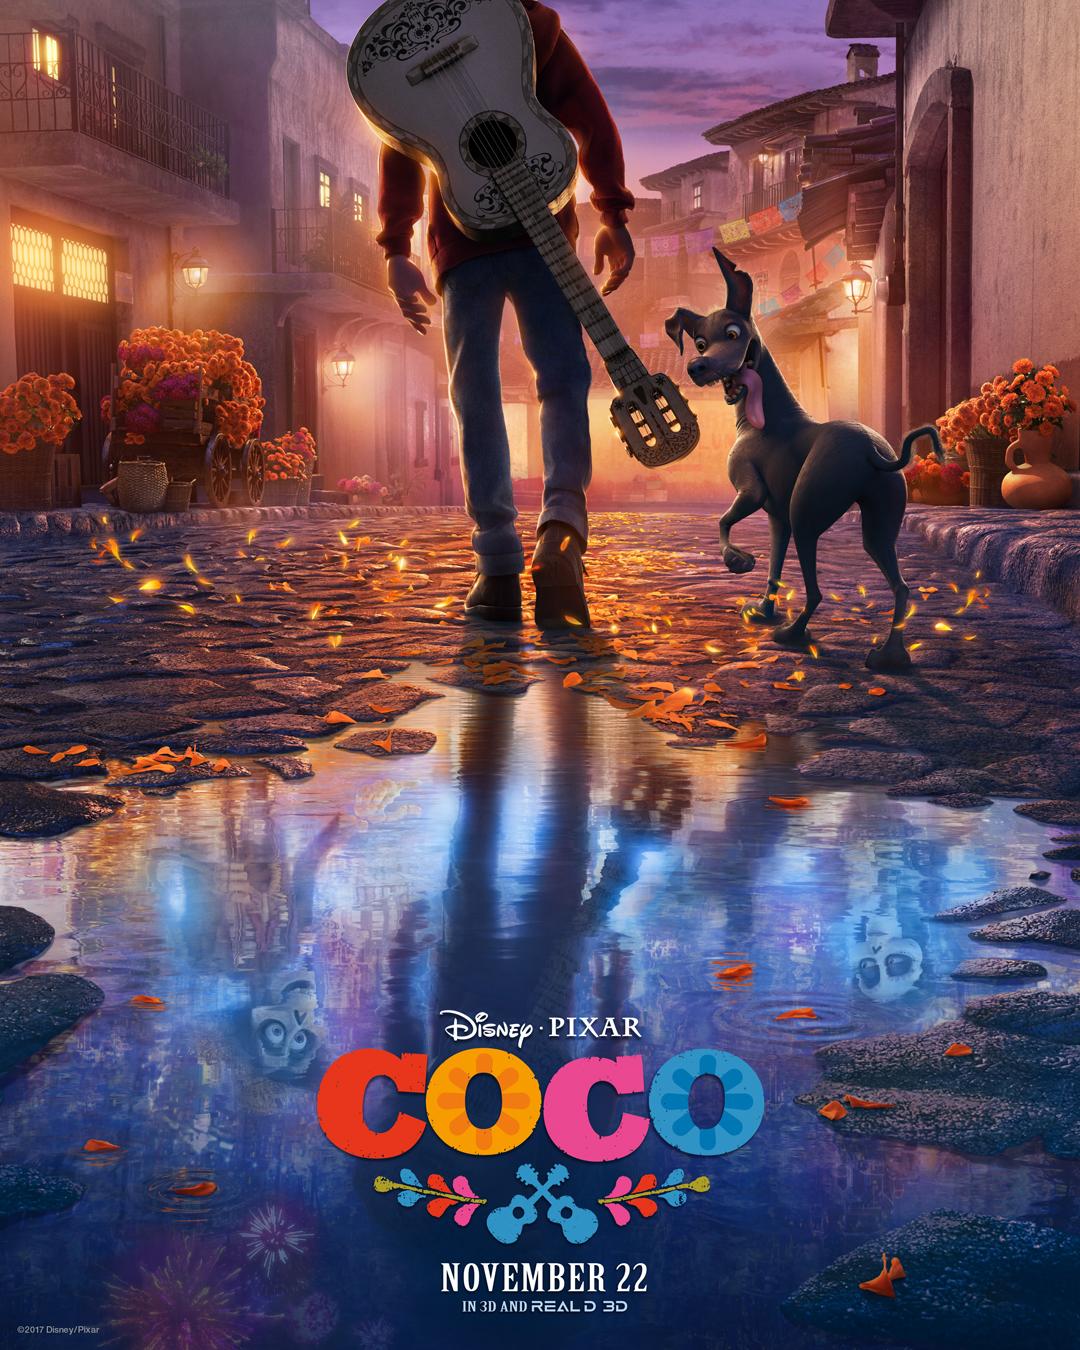 Coco 2017 animated cinemorgue wiki fandom powered by wikia coco teaser ig jpeg v4 stopboris Gallery